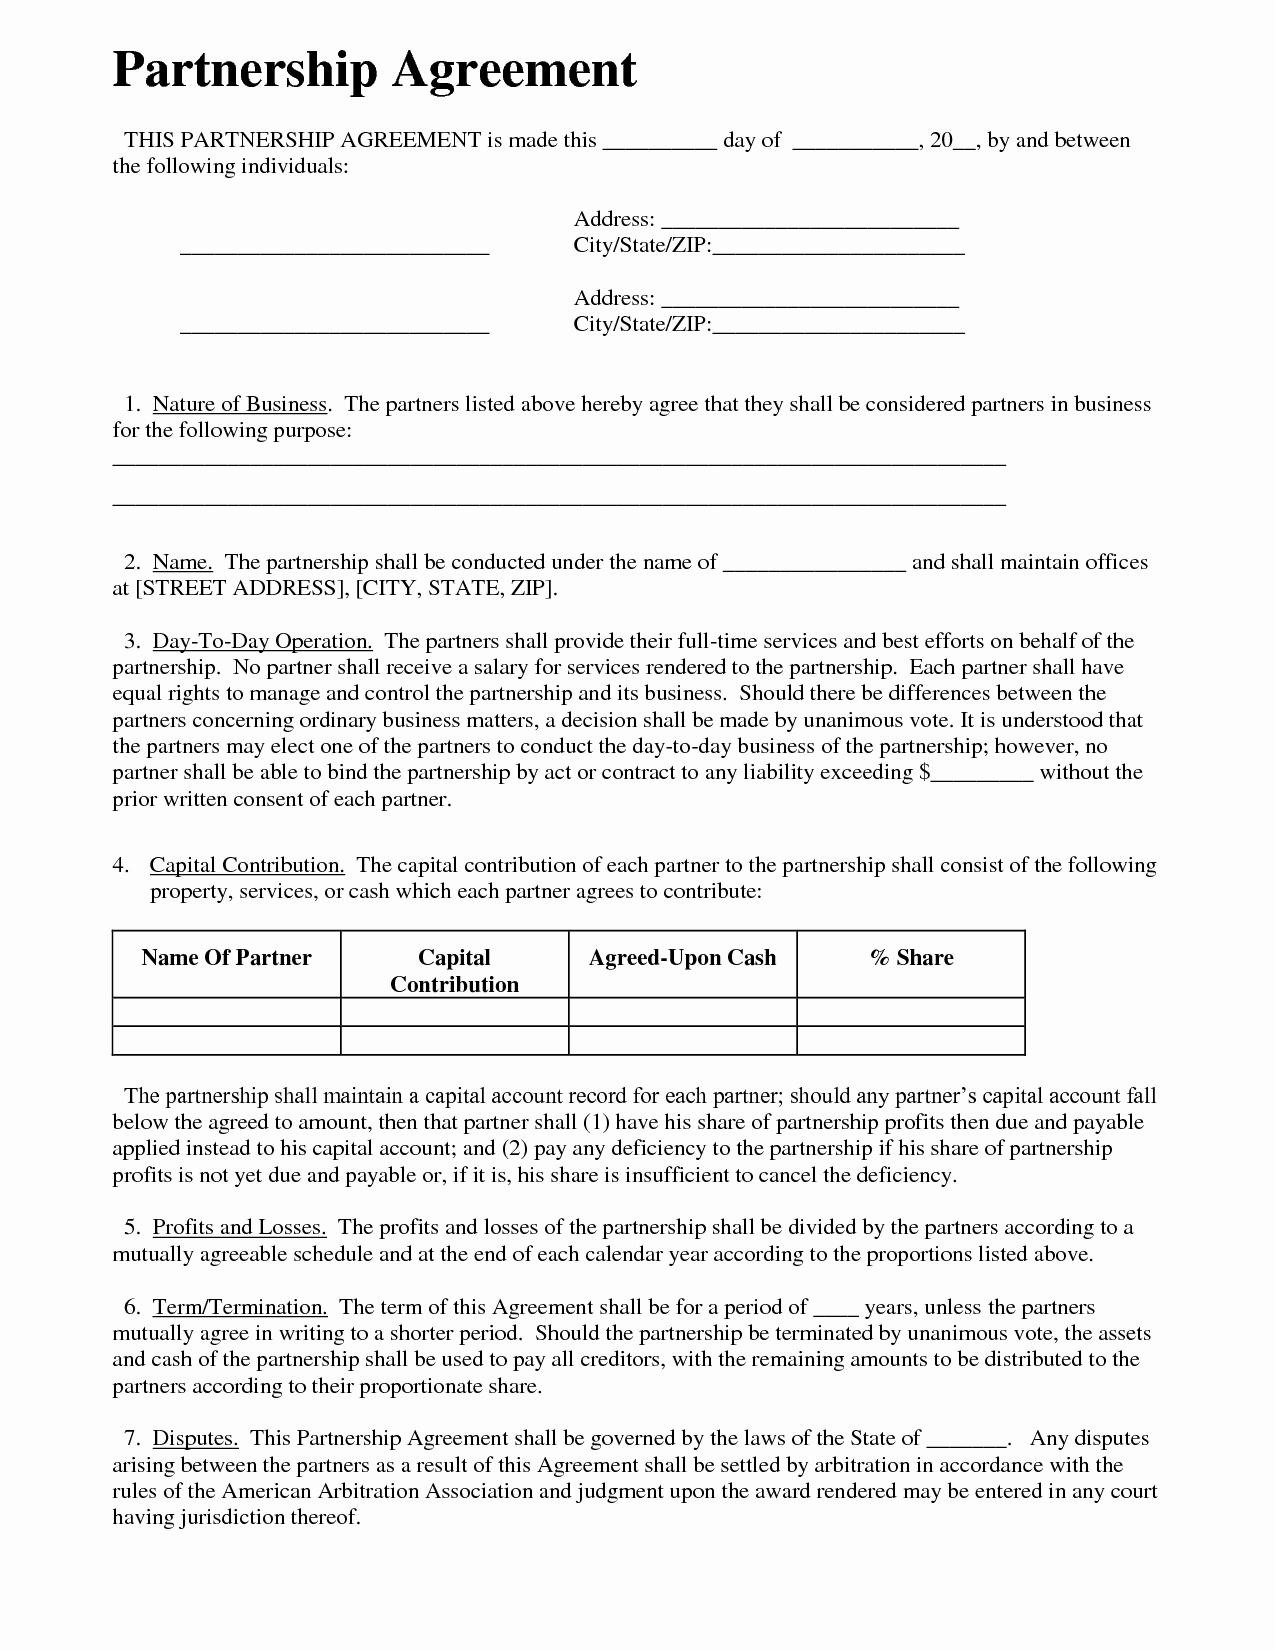 Partnership Agreement Business Templates